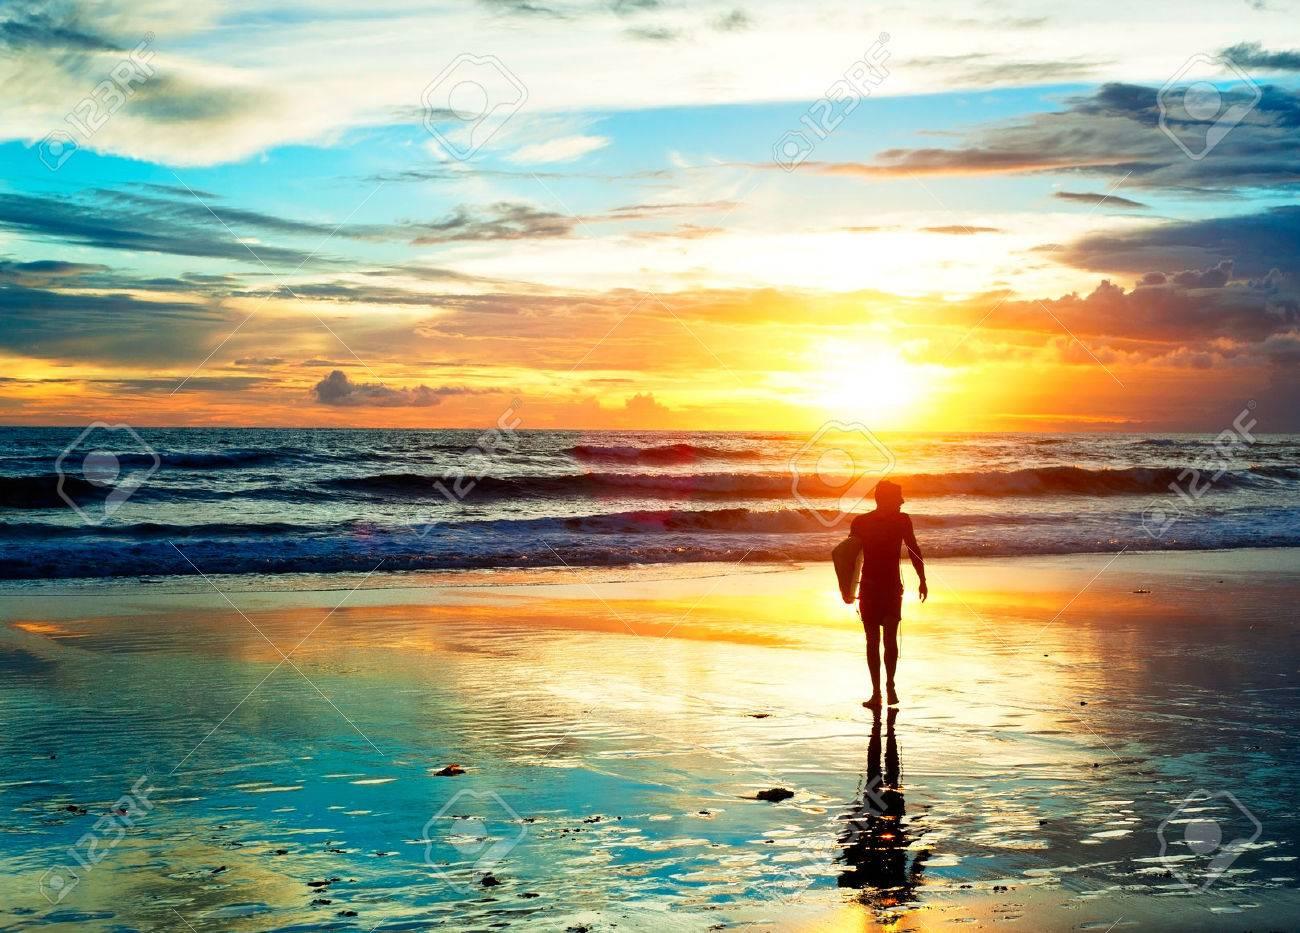 Surfer walking on the beach in sunset light. Bali island, Indonesia - 33067098